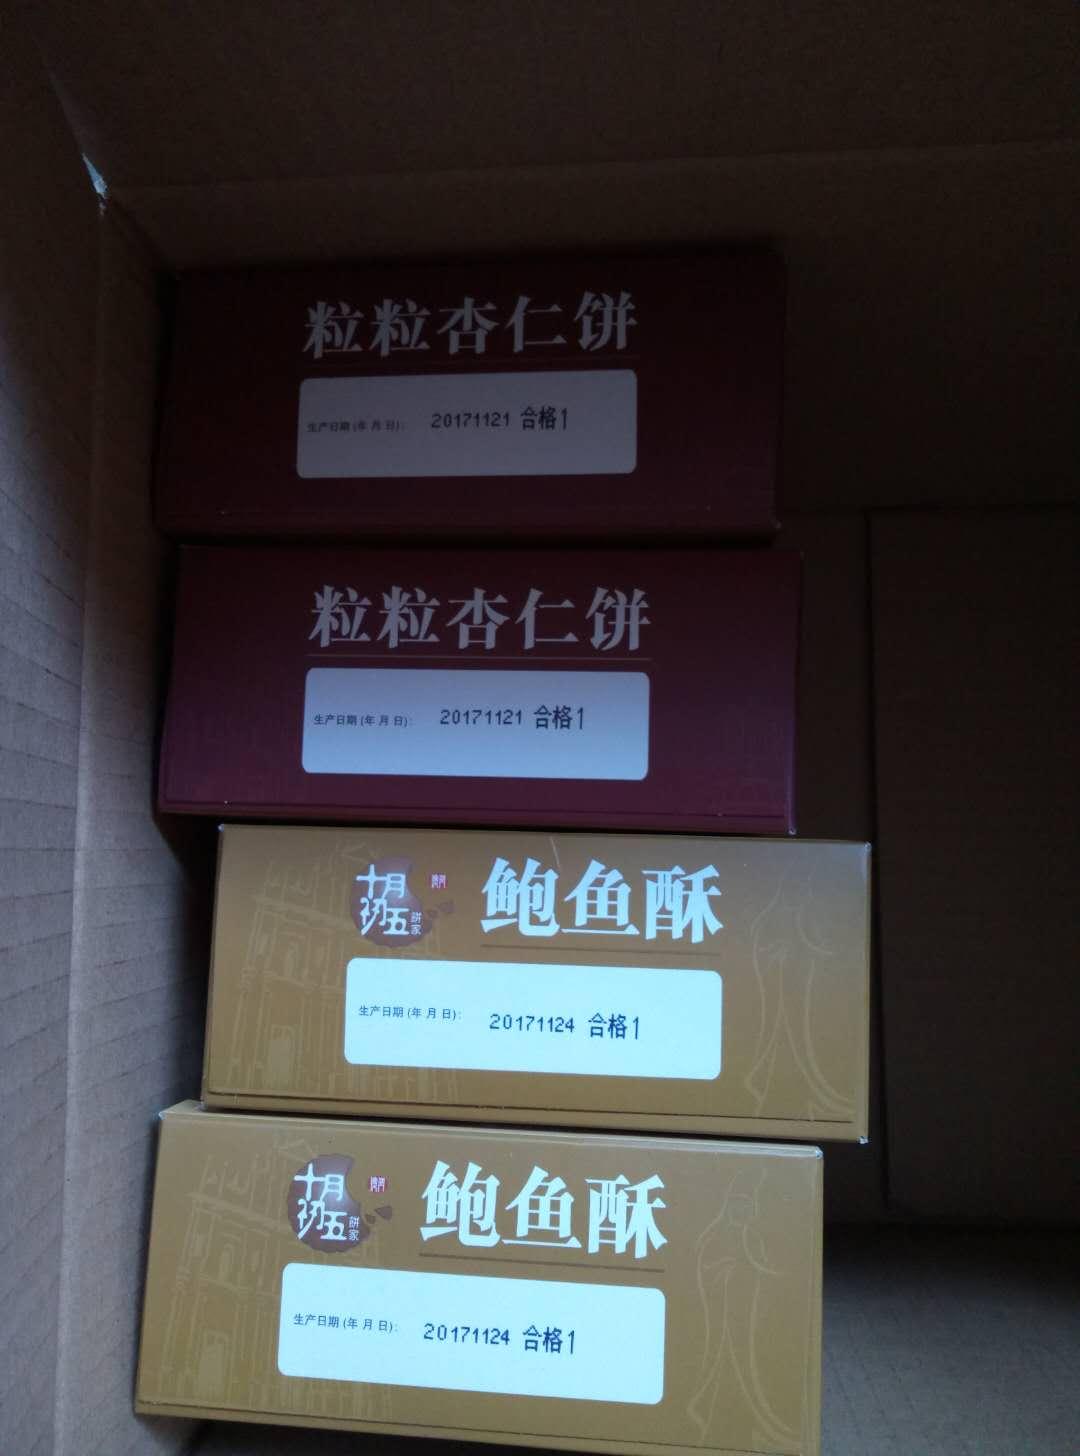 nike free run 4.0 black and green 002 balenciaga nike shoes 26157 cheaponsale